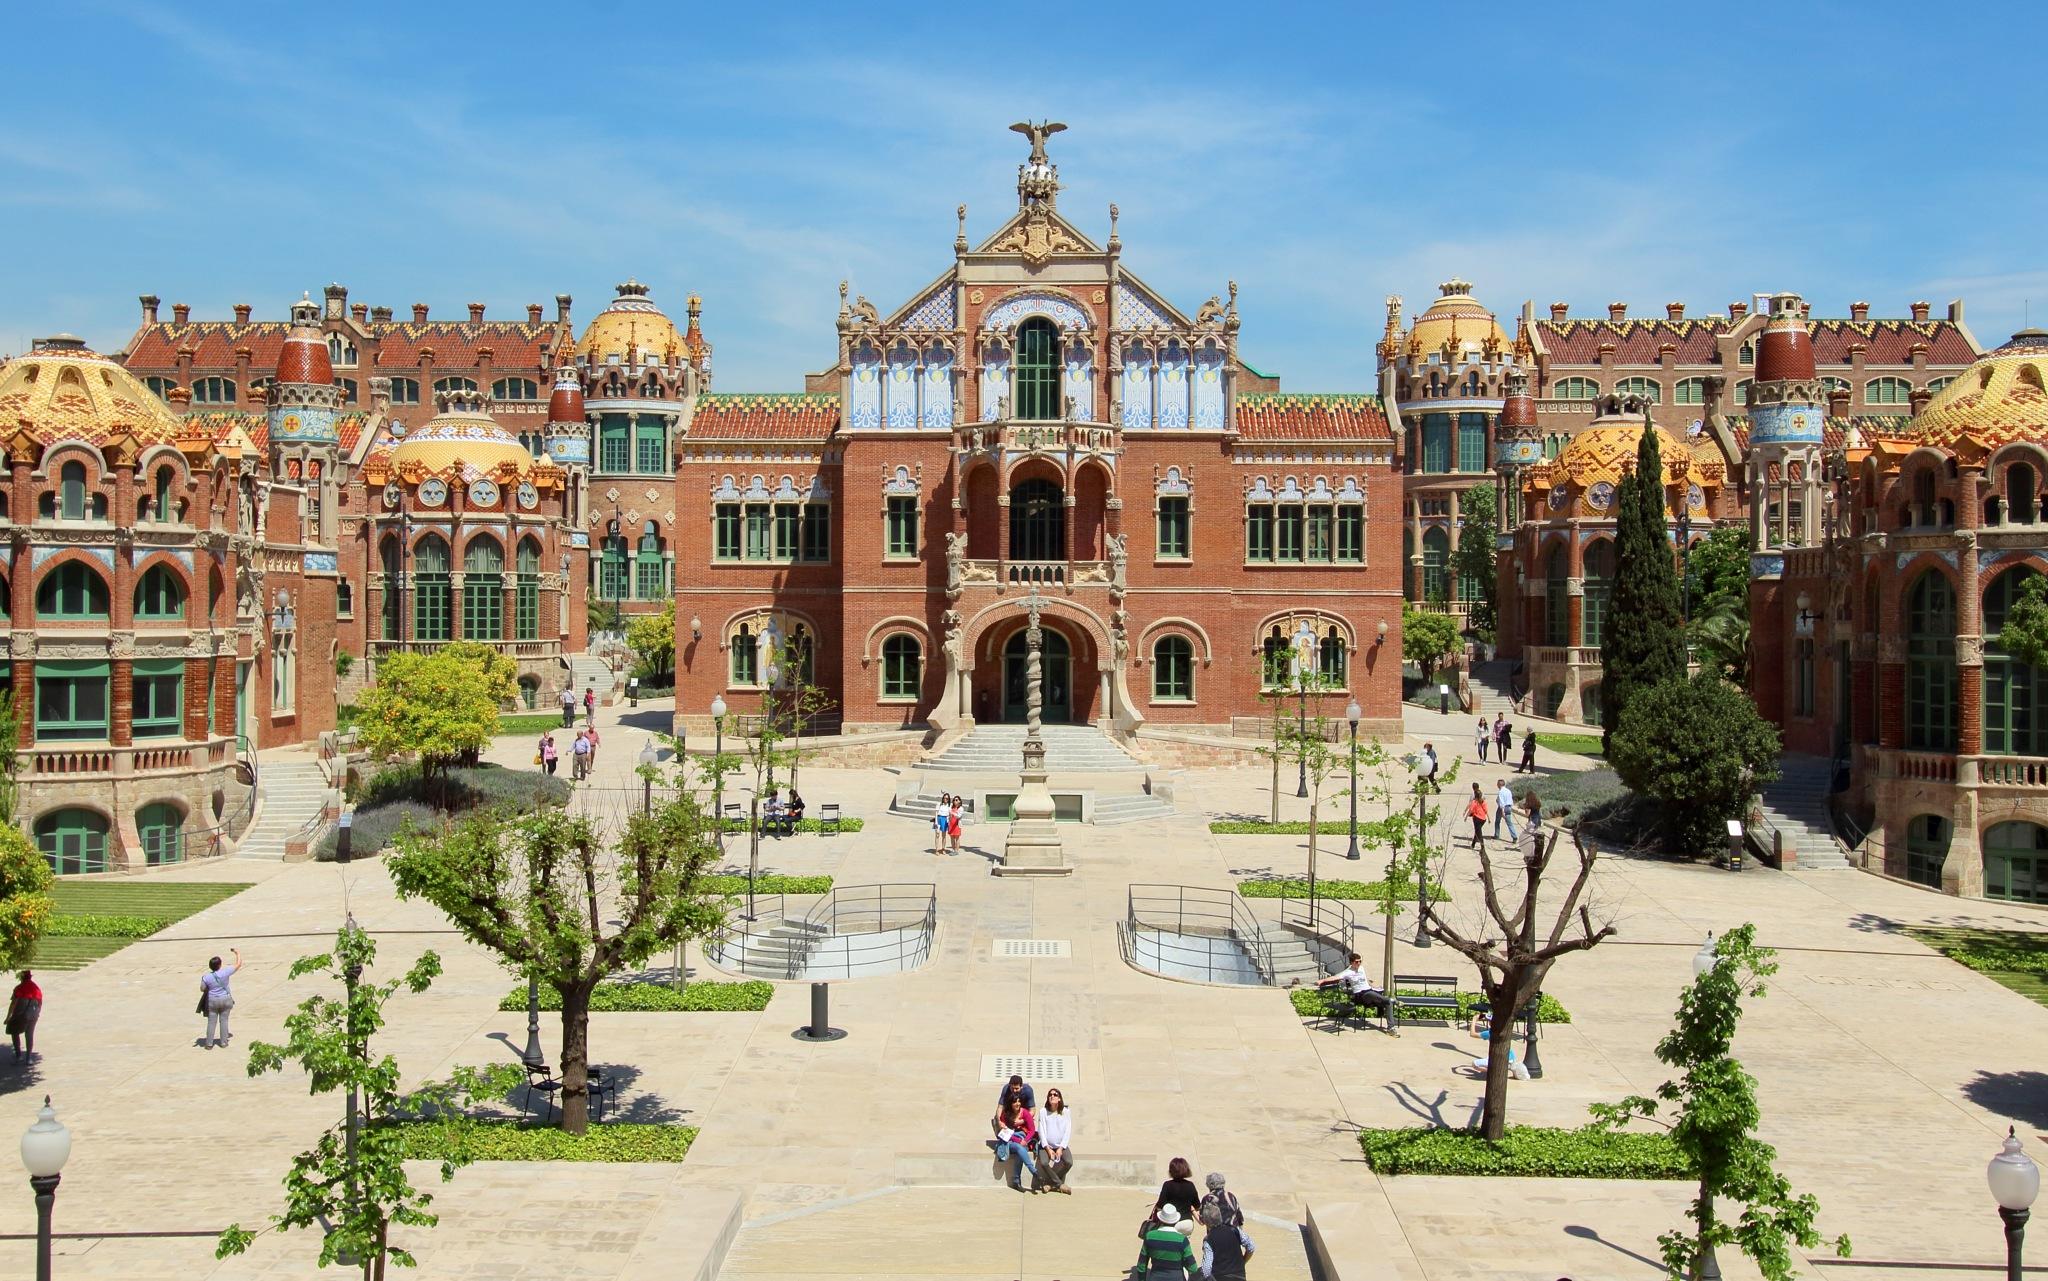 Hôpital San Pau, Barcelone by katze